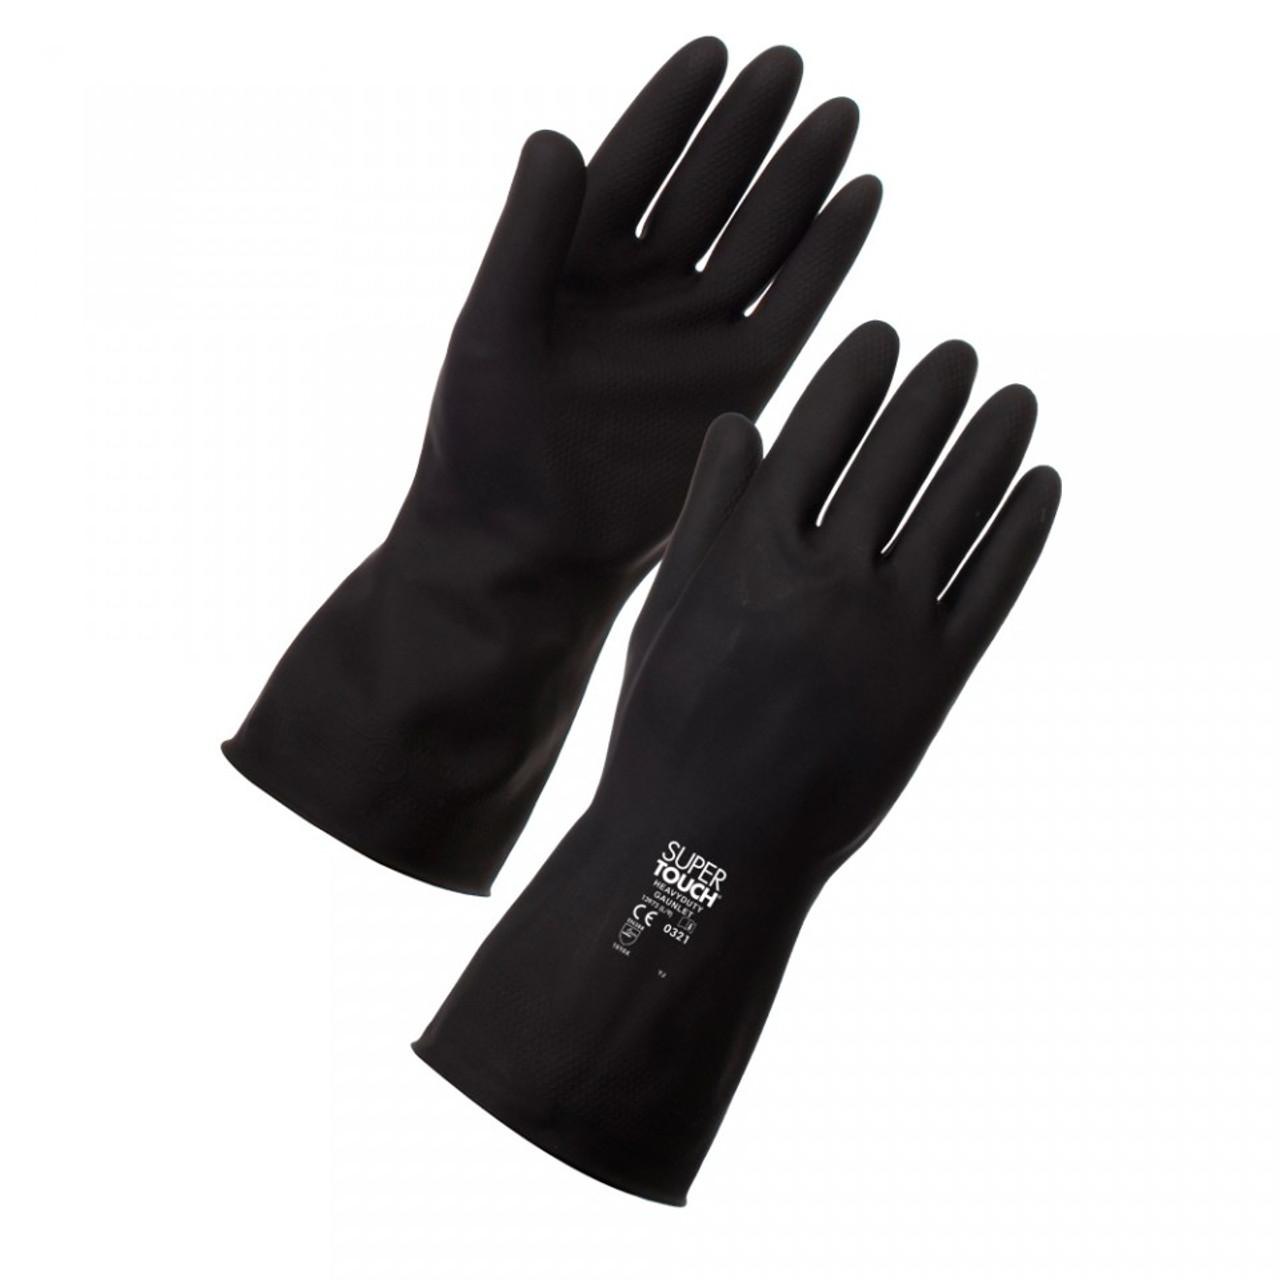 Heavy Duty Latex Gloves Black Pack Size 1 Pair